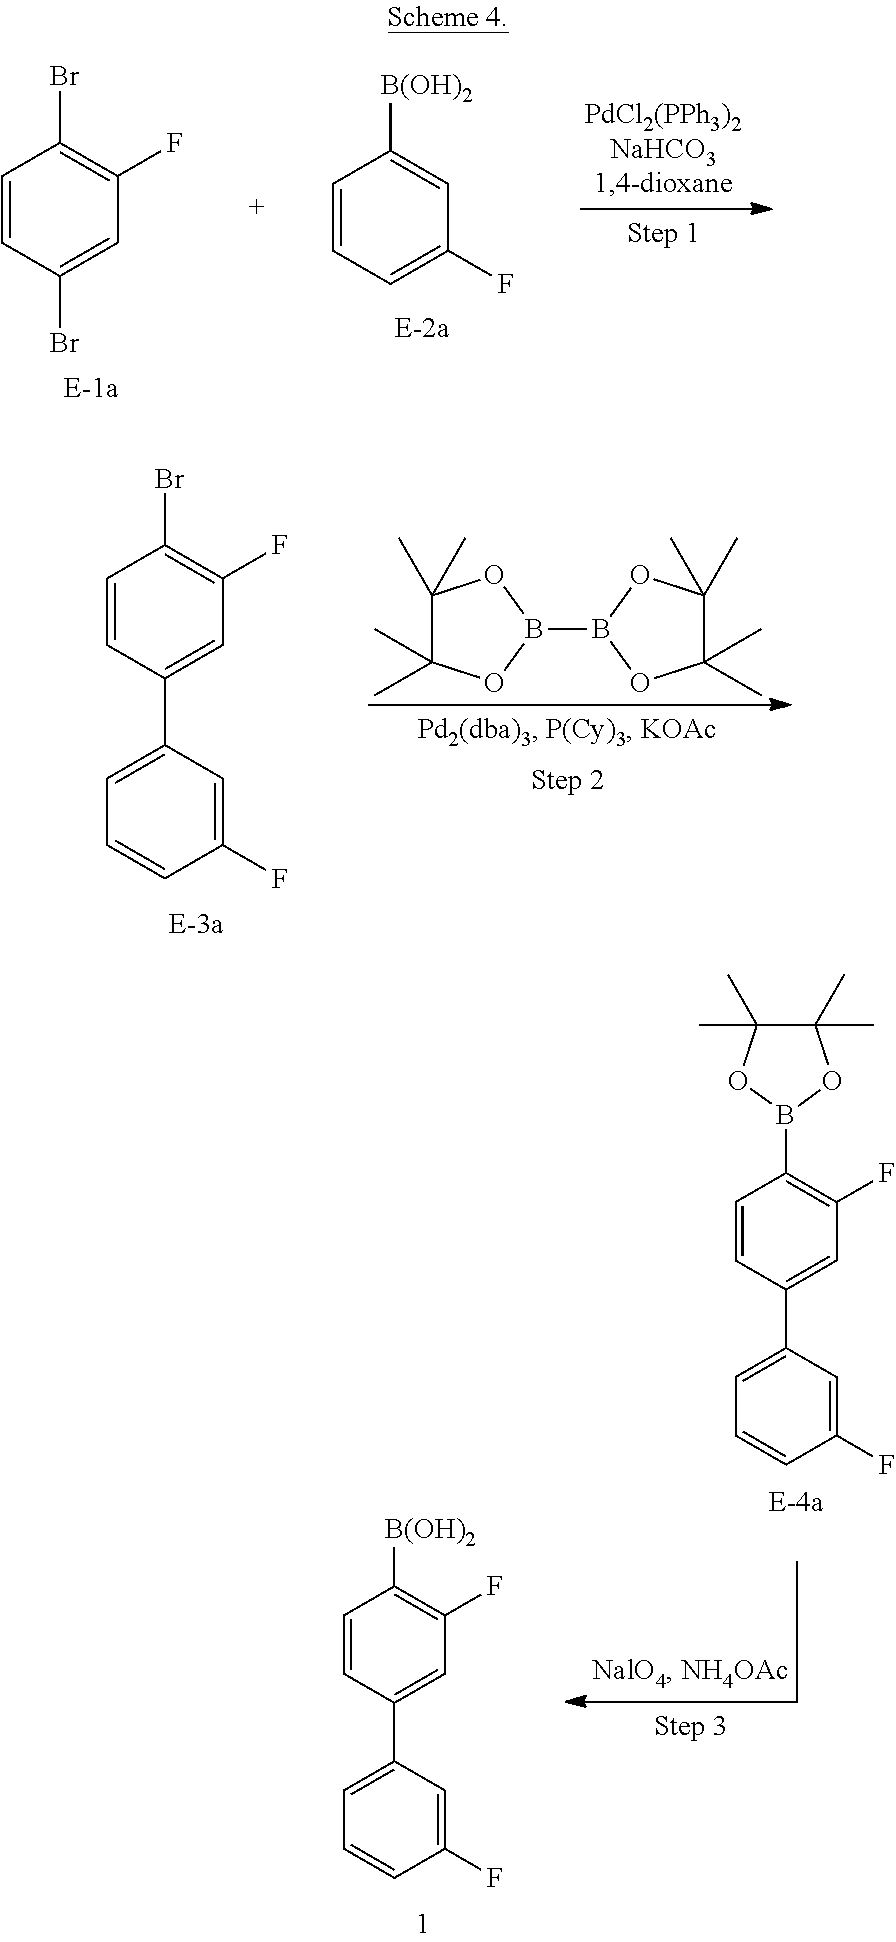 us9034849b2 fatty acid amide hydrolase inhibitors patents Show Me a Simple Resume figure us09034849 20150519 c00032